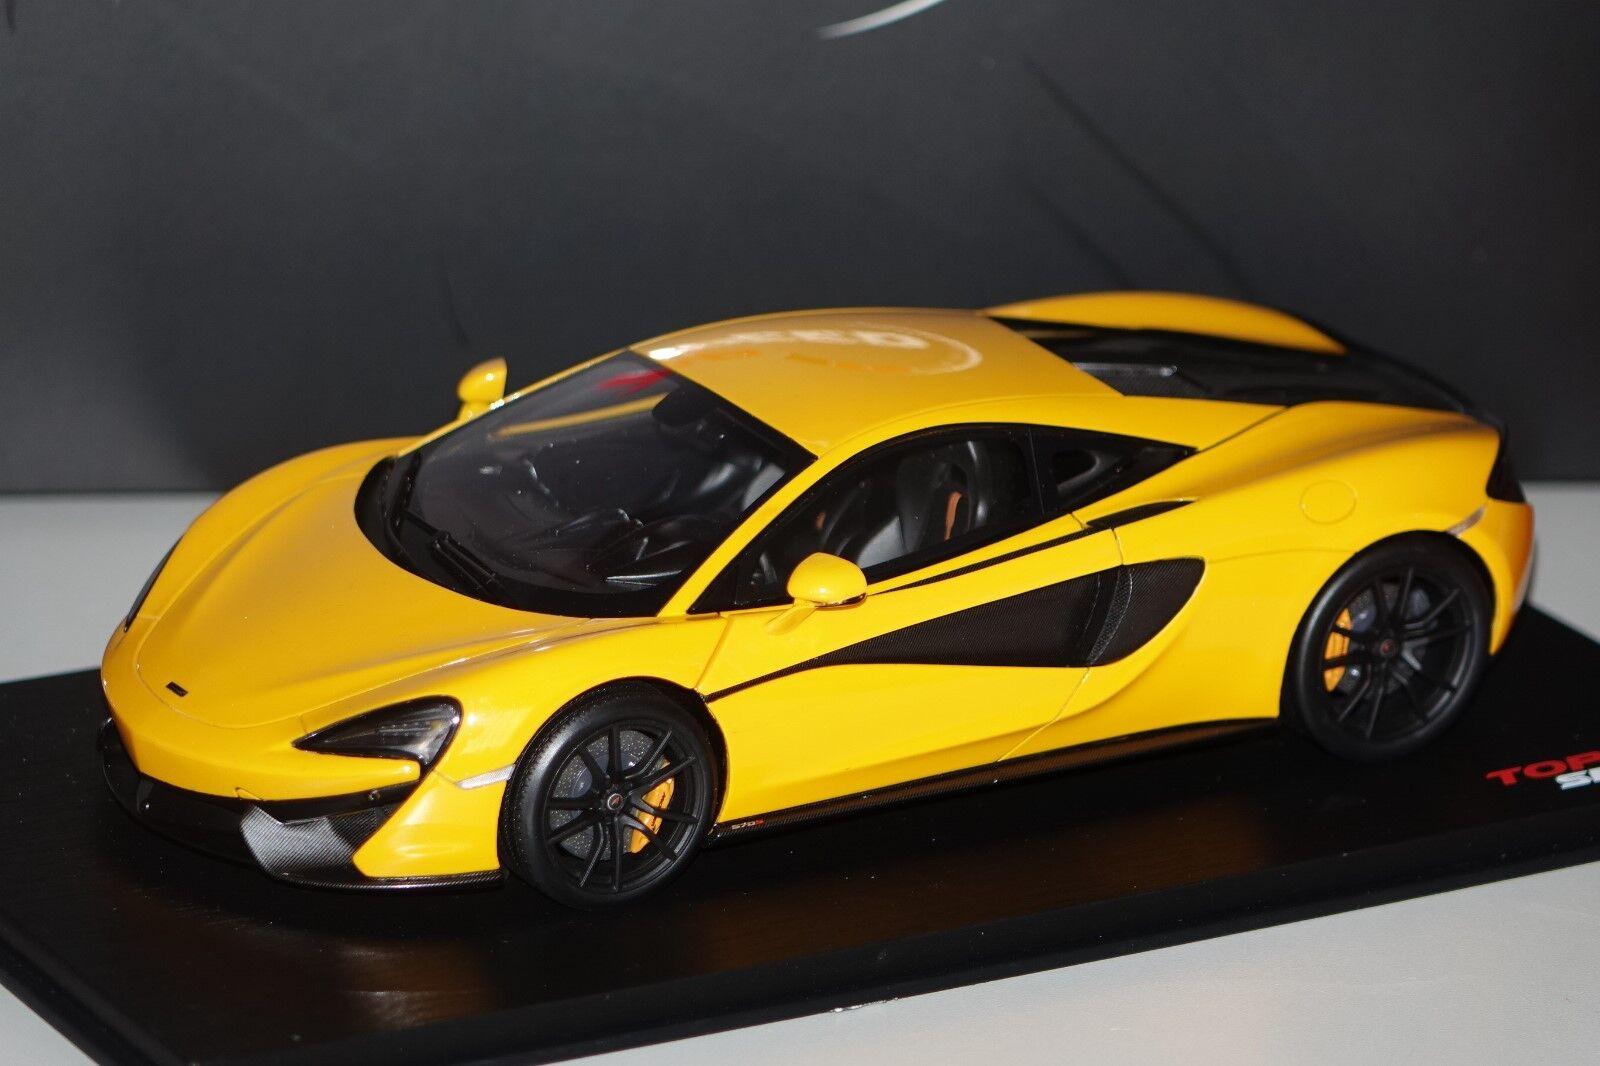 McLaren 570 S Jaune 1 of 999 1 18 TOP SPEED ts0046 NOUVEAU & NEUF dans sa boîte